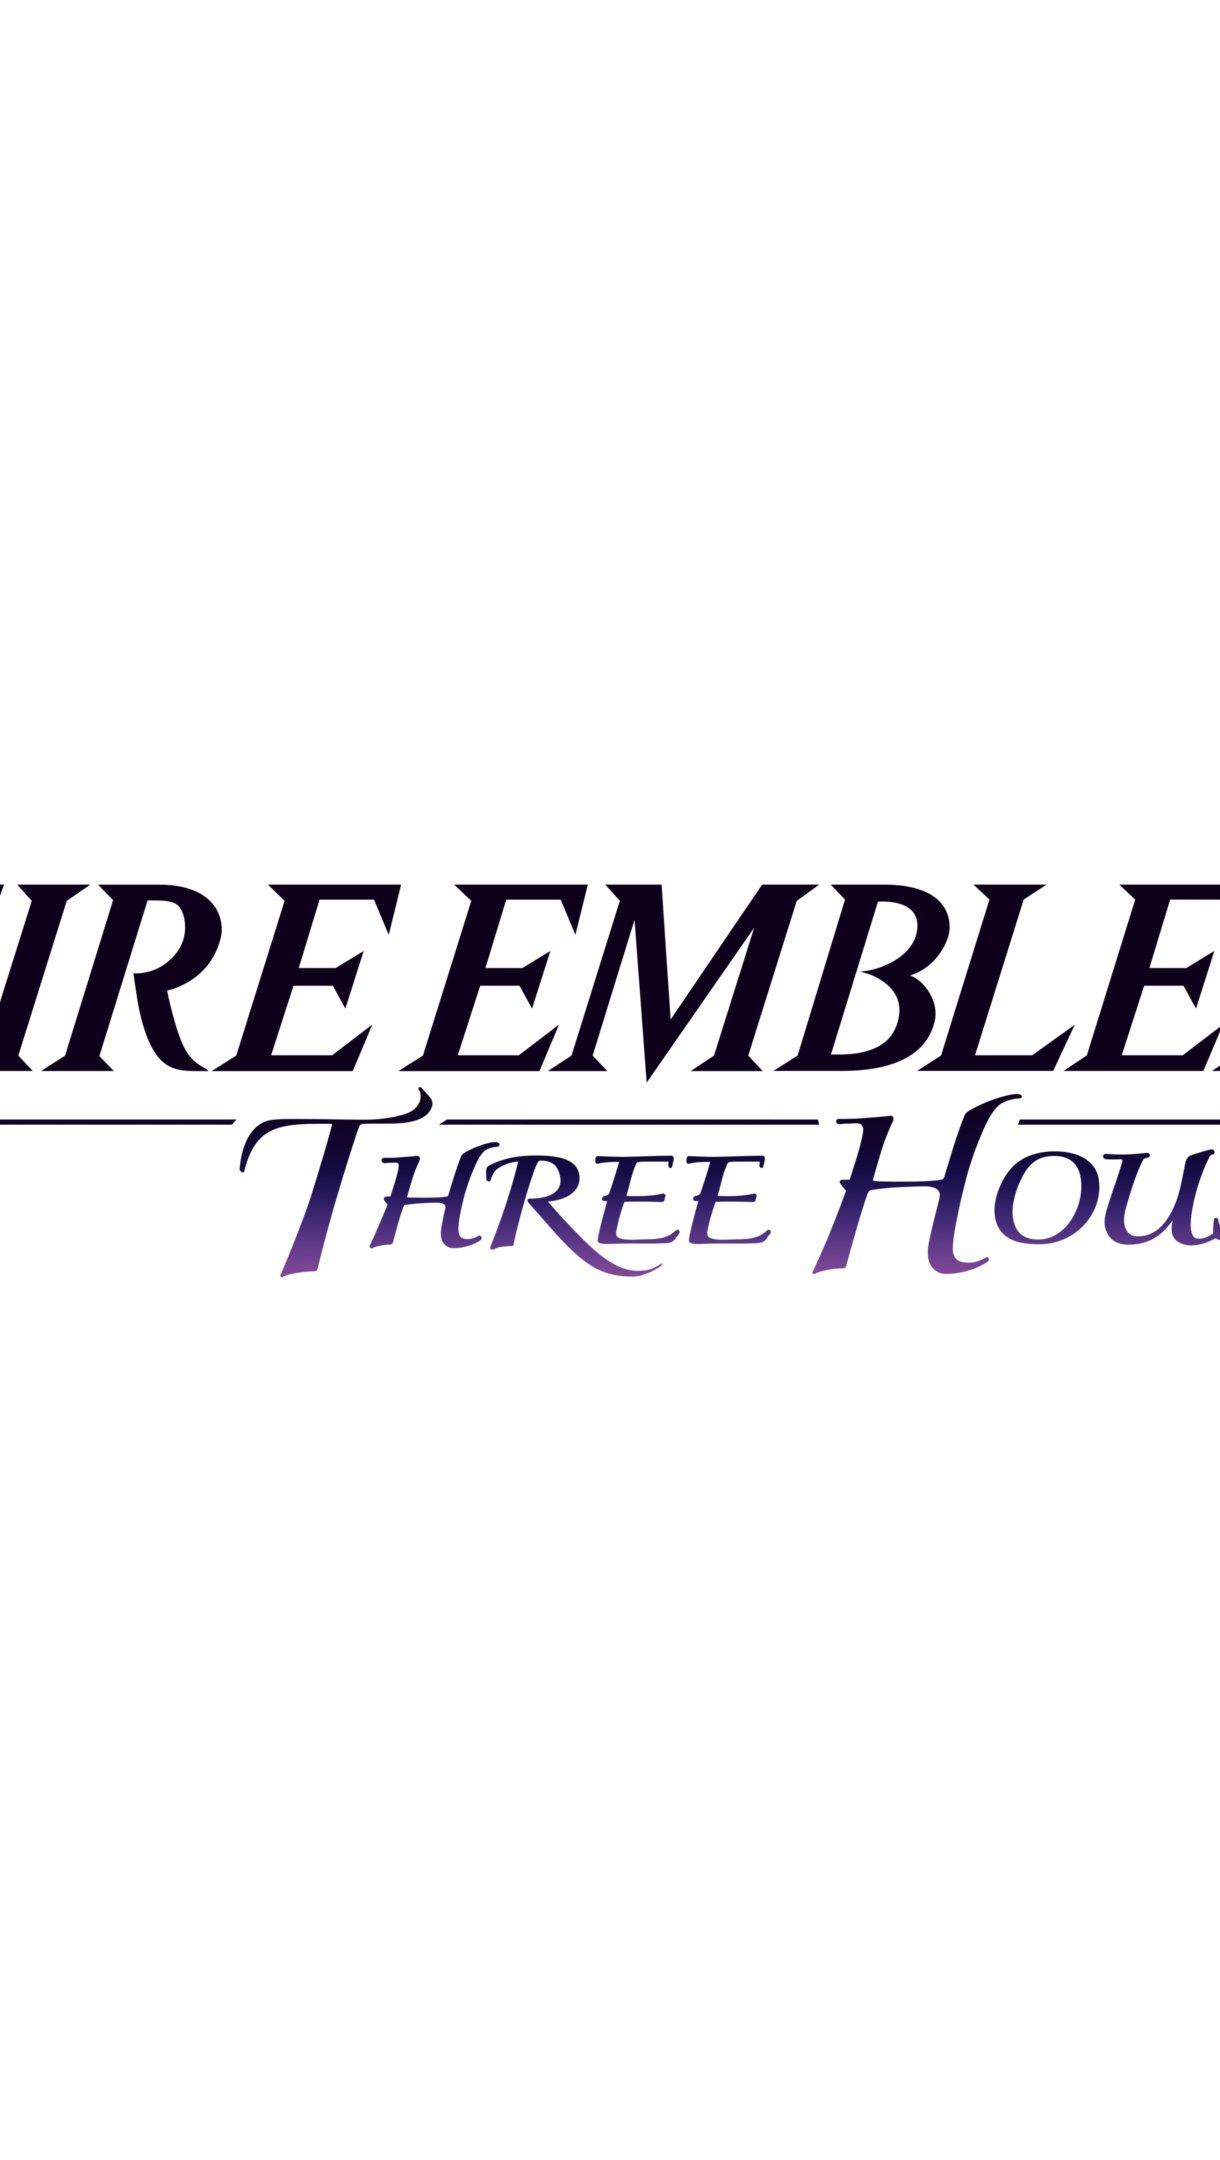 Fondos de pantalla Logo Fire Emblem: Three Houses Vertical